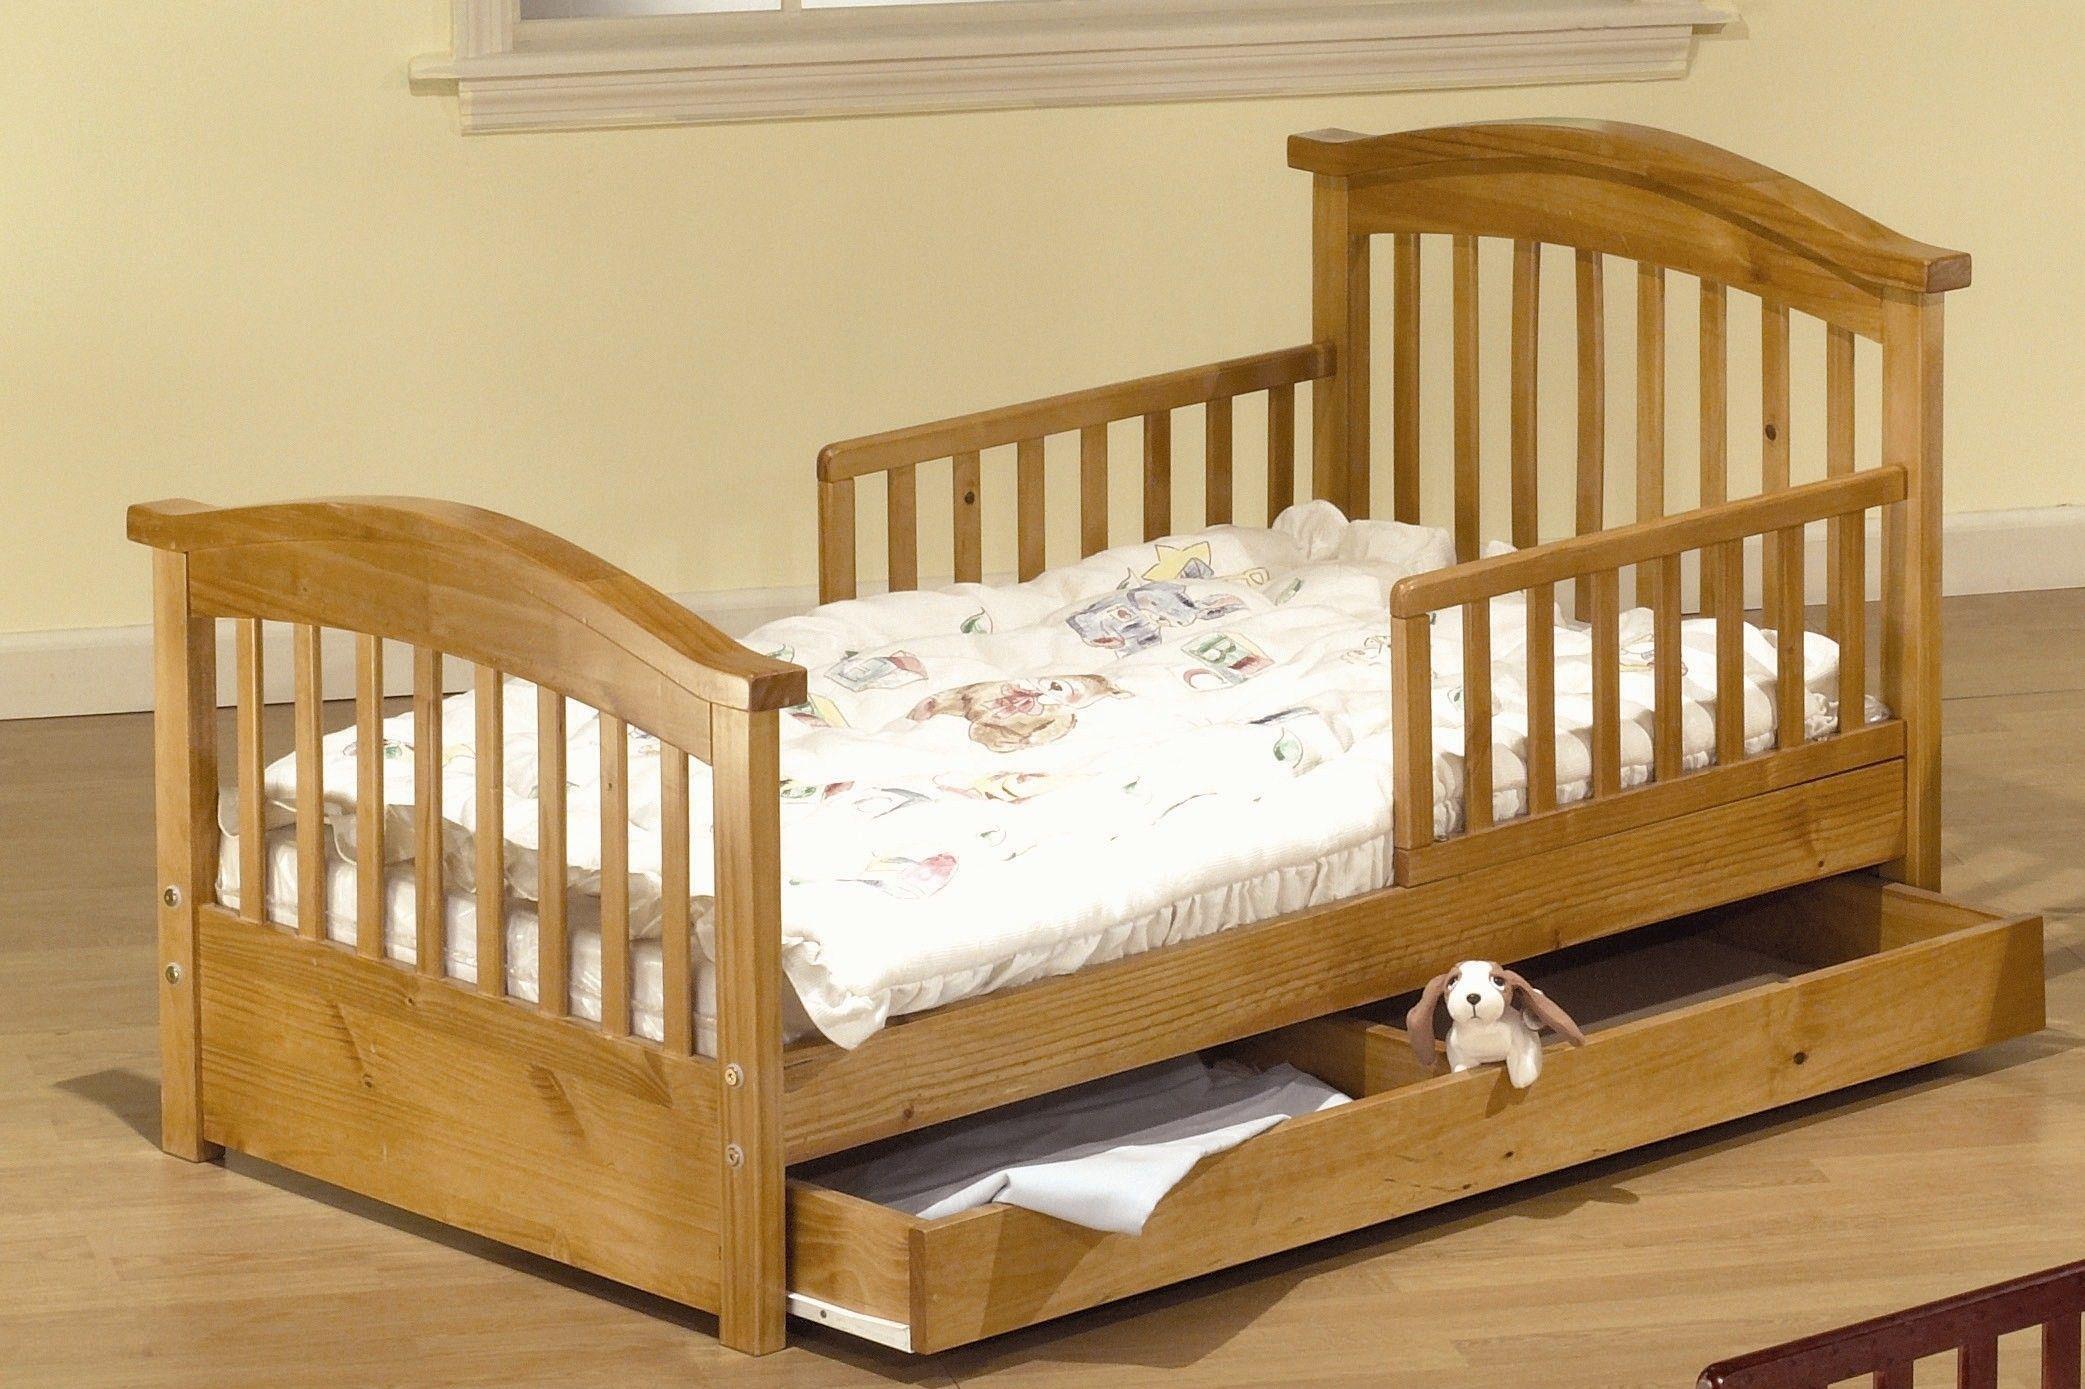 Sorelle Grande Toddler Bed with drawer $199.99